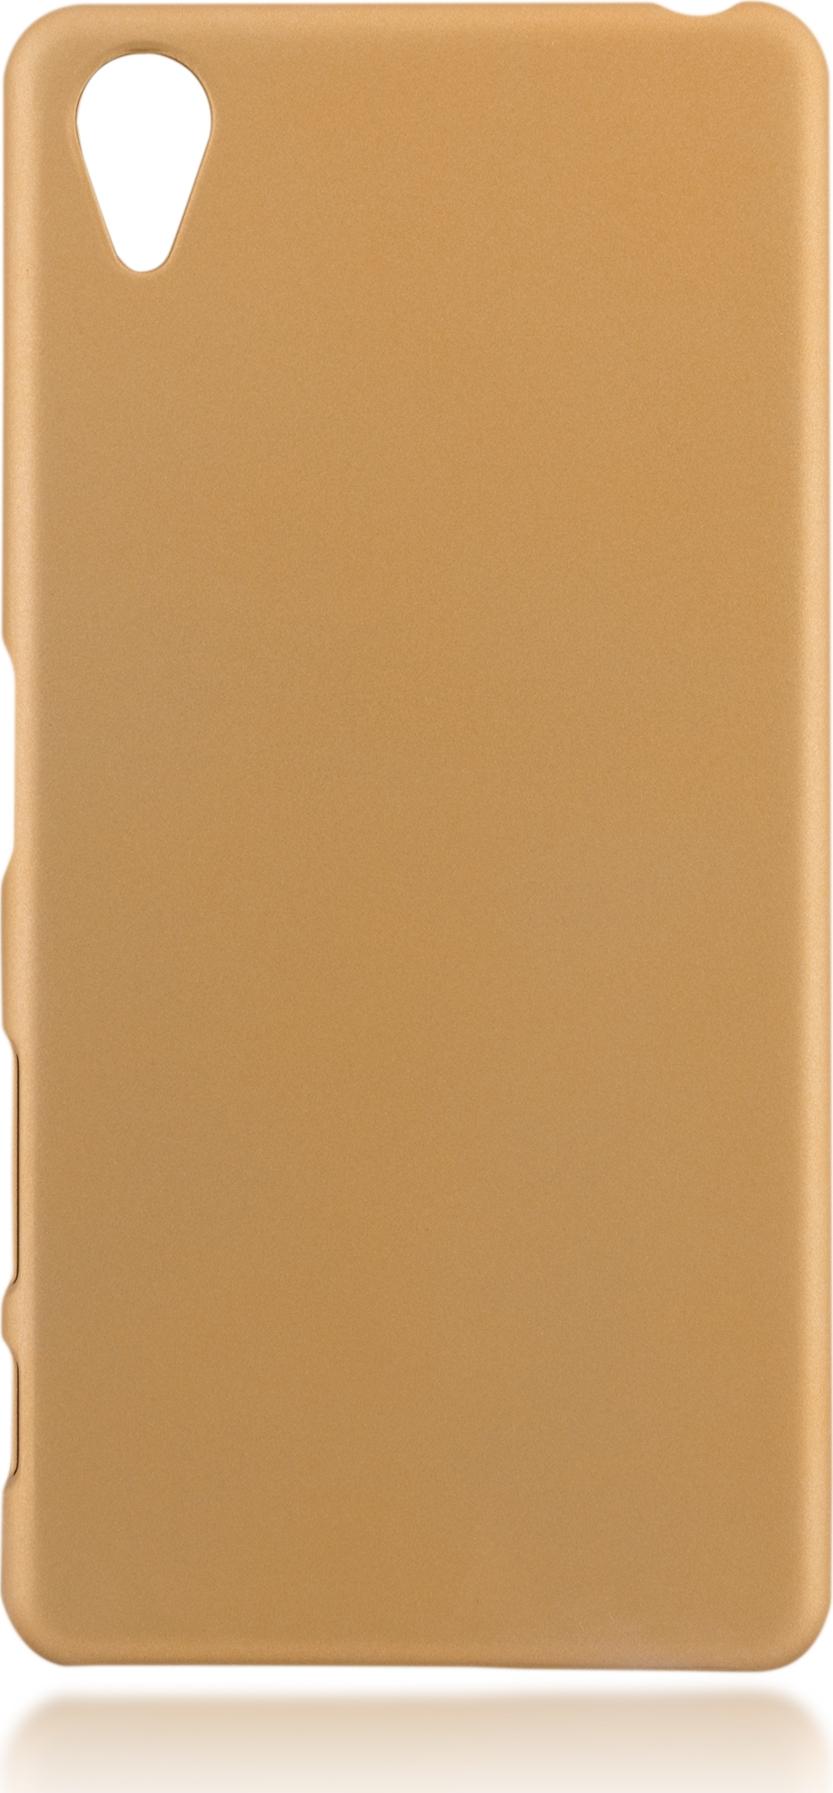 Чехол Brosco Soft-Touch для Sony Xperia X Perfomance, шампань цена